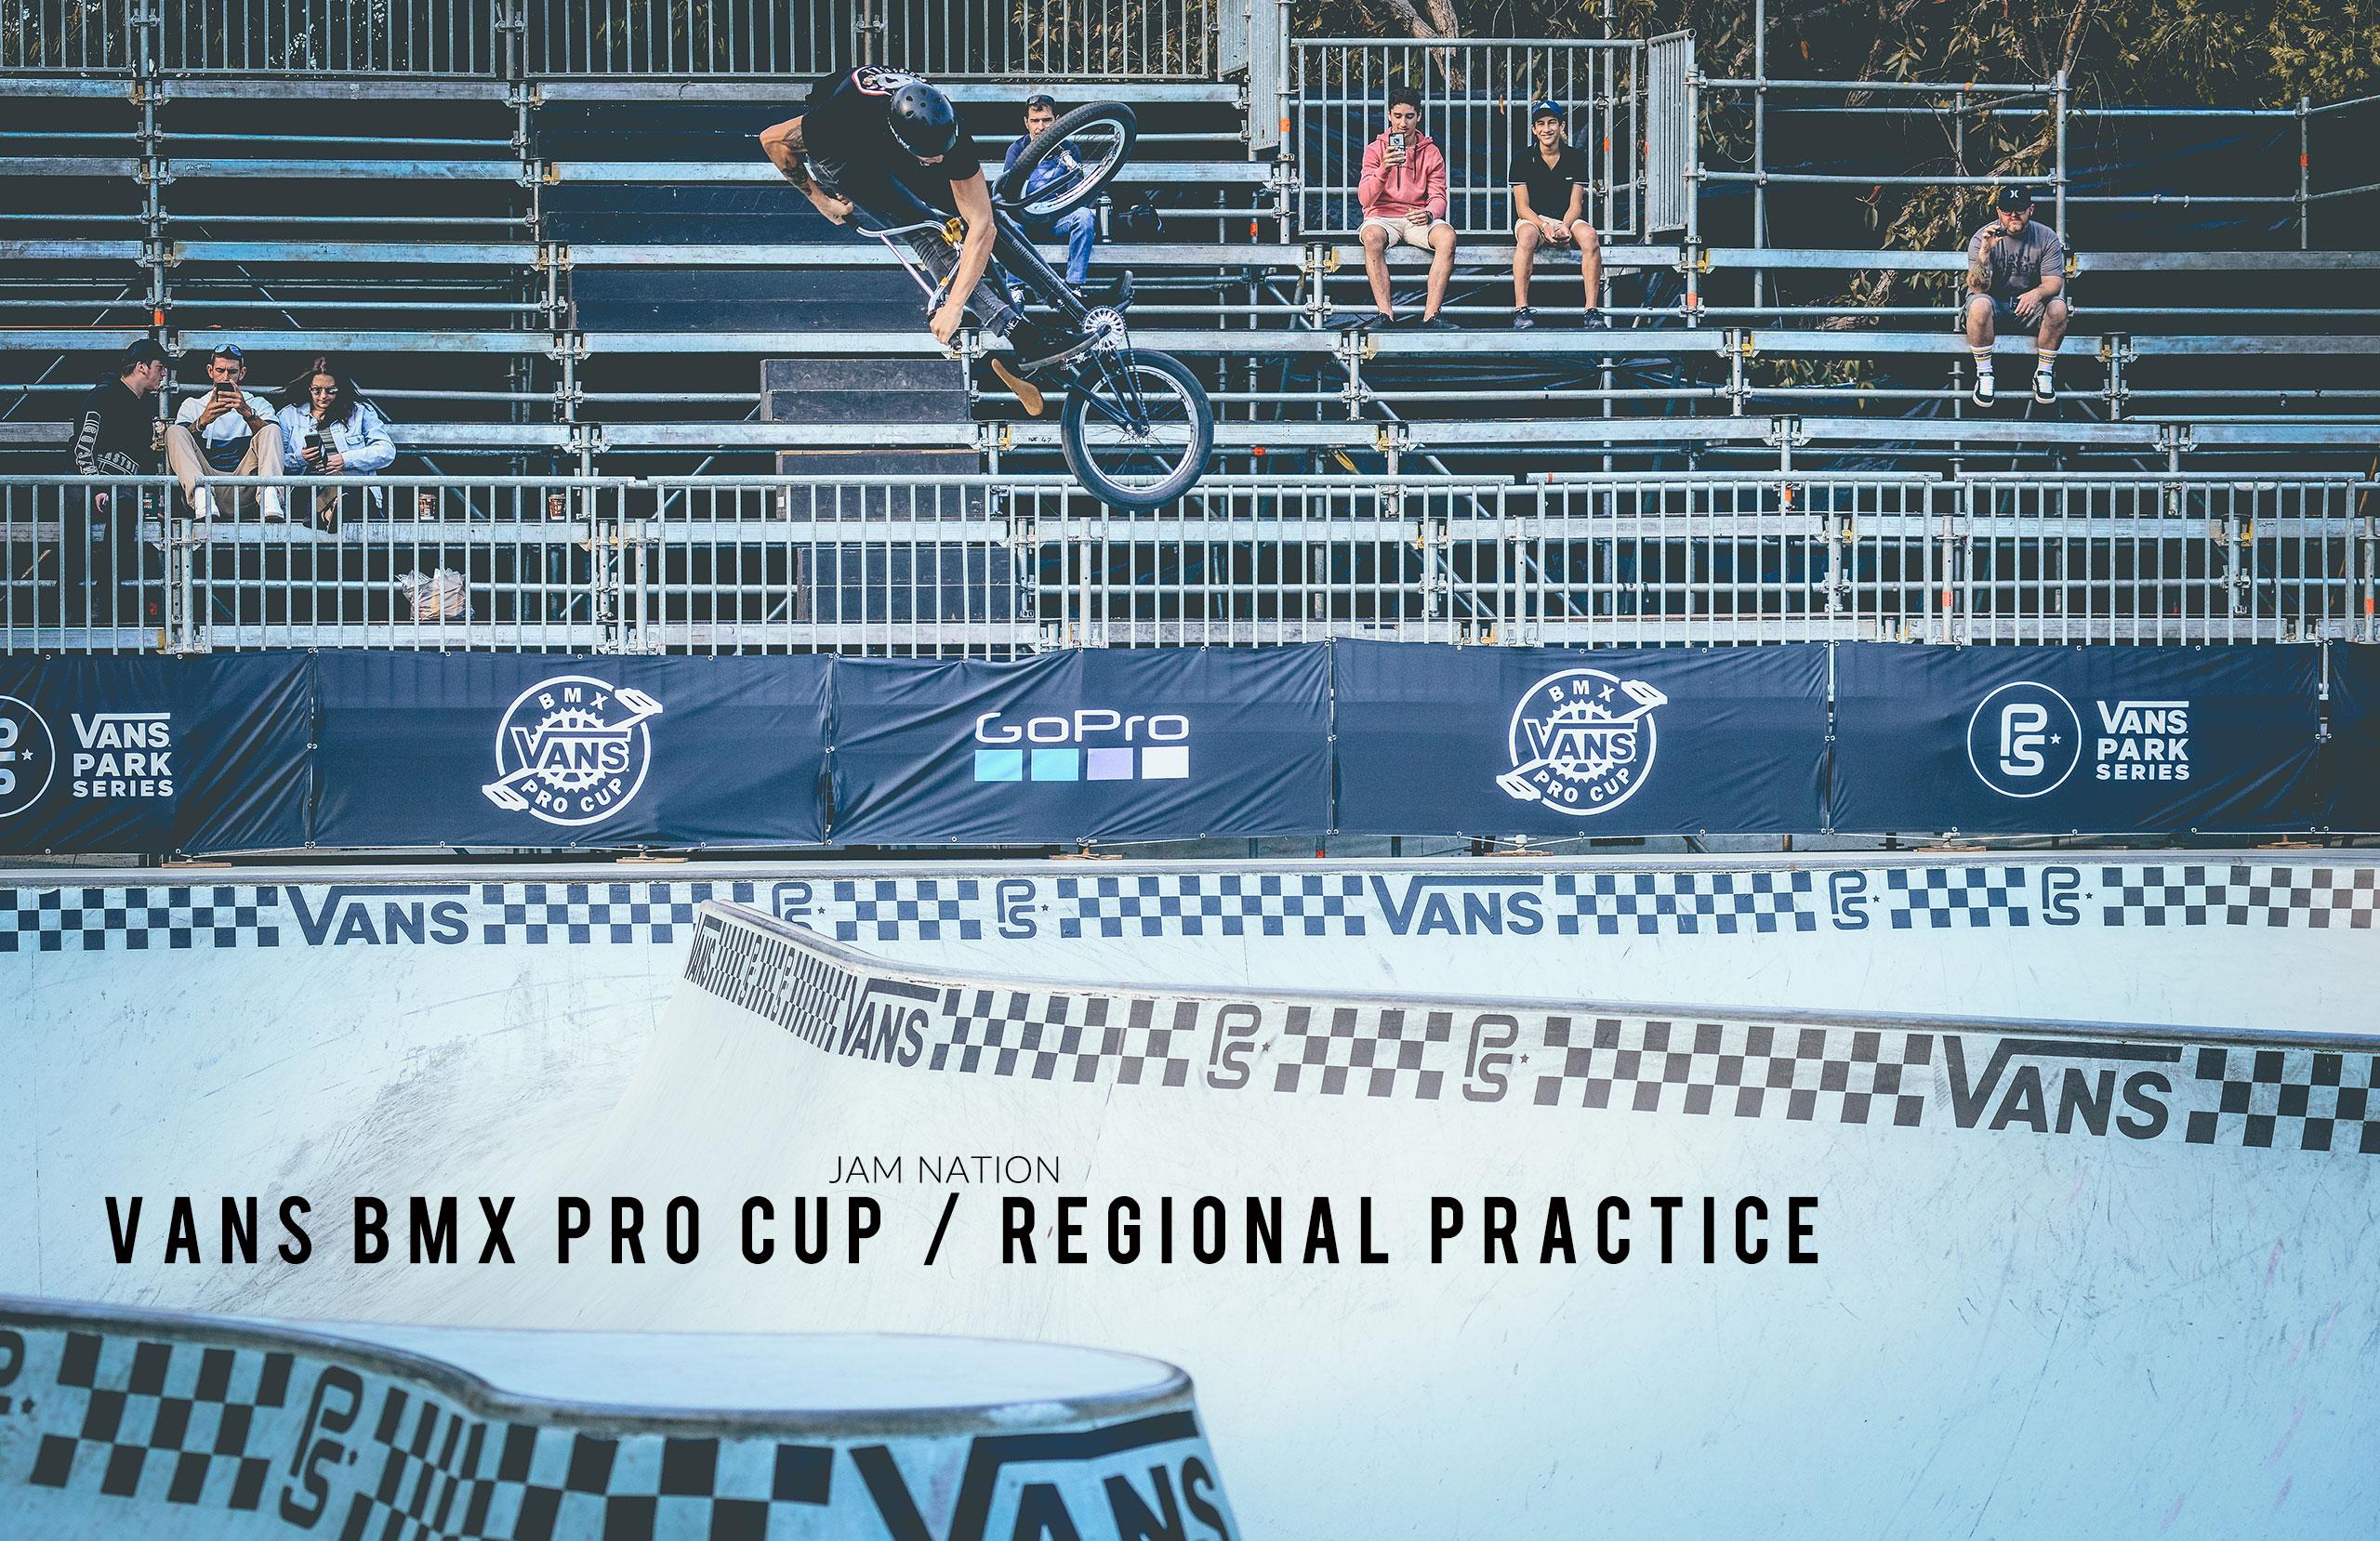 Vans BMX Pro Cup – Regional Practice